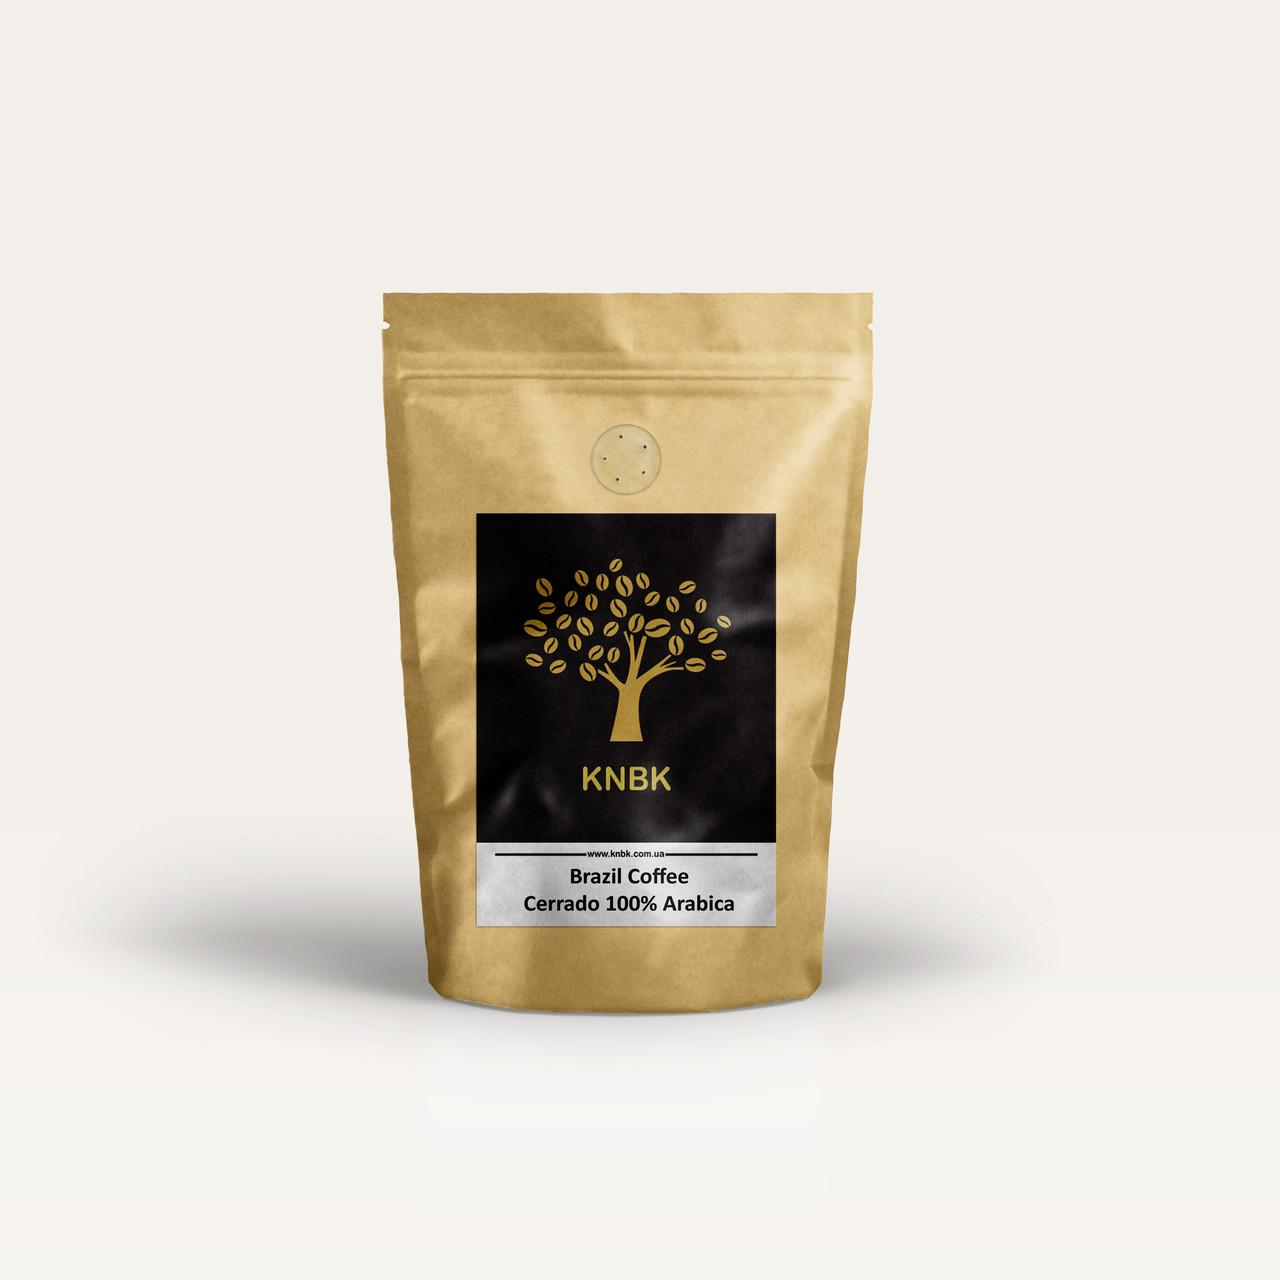 Кофе Арабика Бразилия Серрадо (Arabica Brazil Cerrado Doce Diamantina) Пробник 100гр.